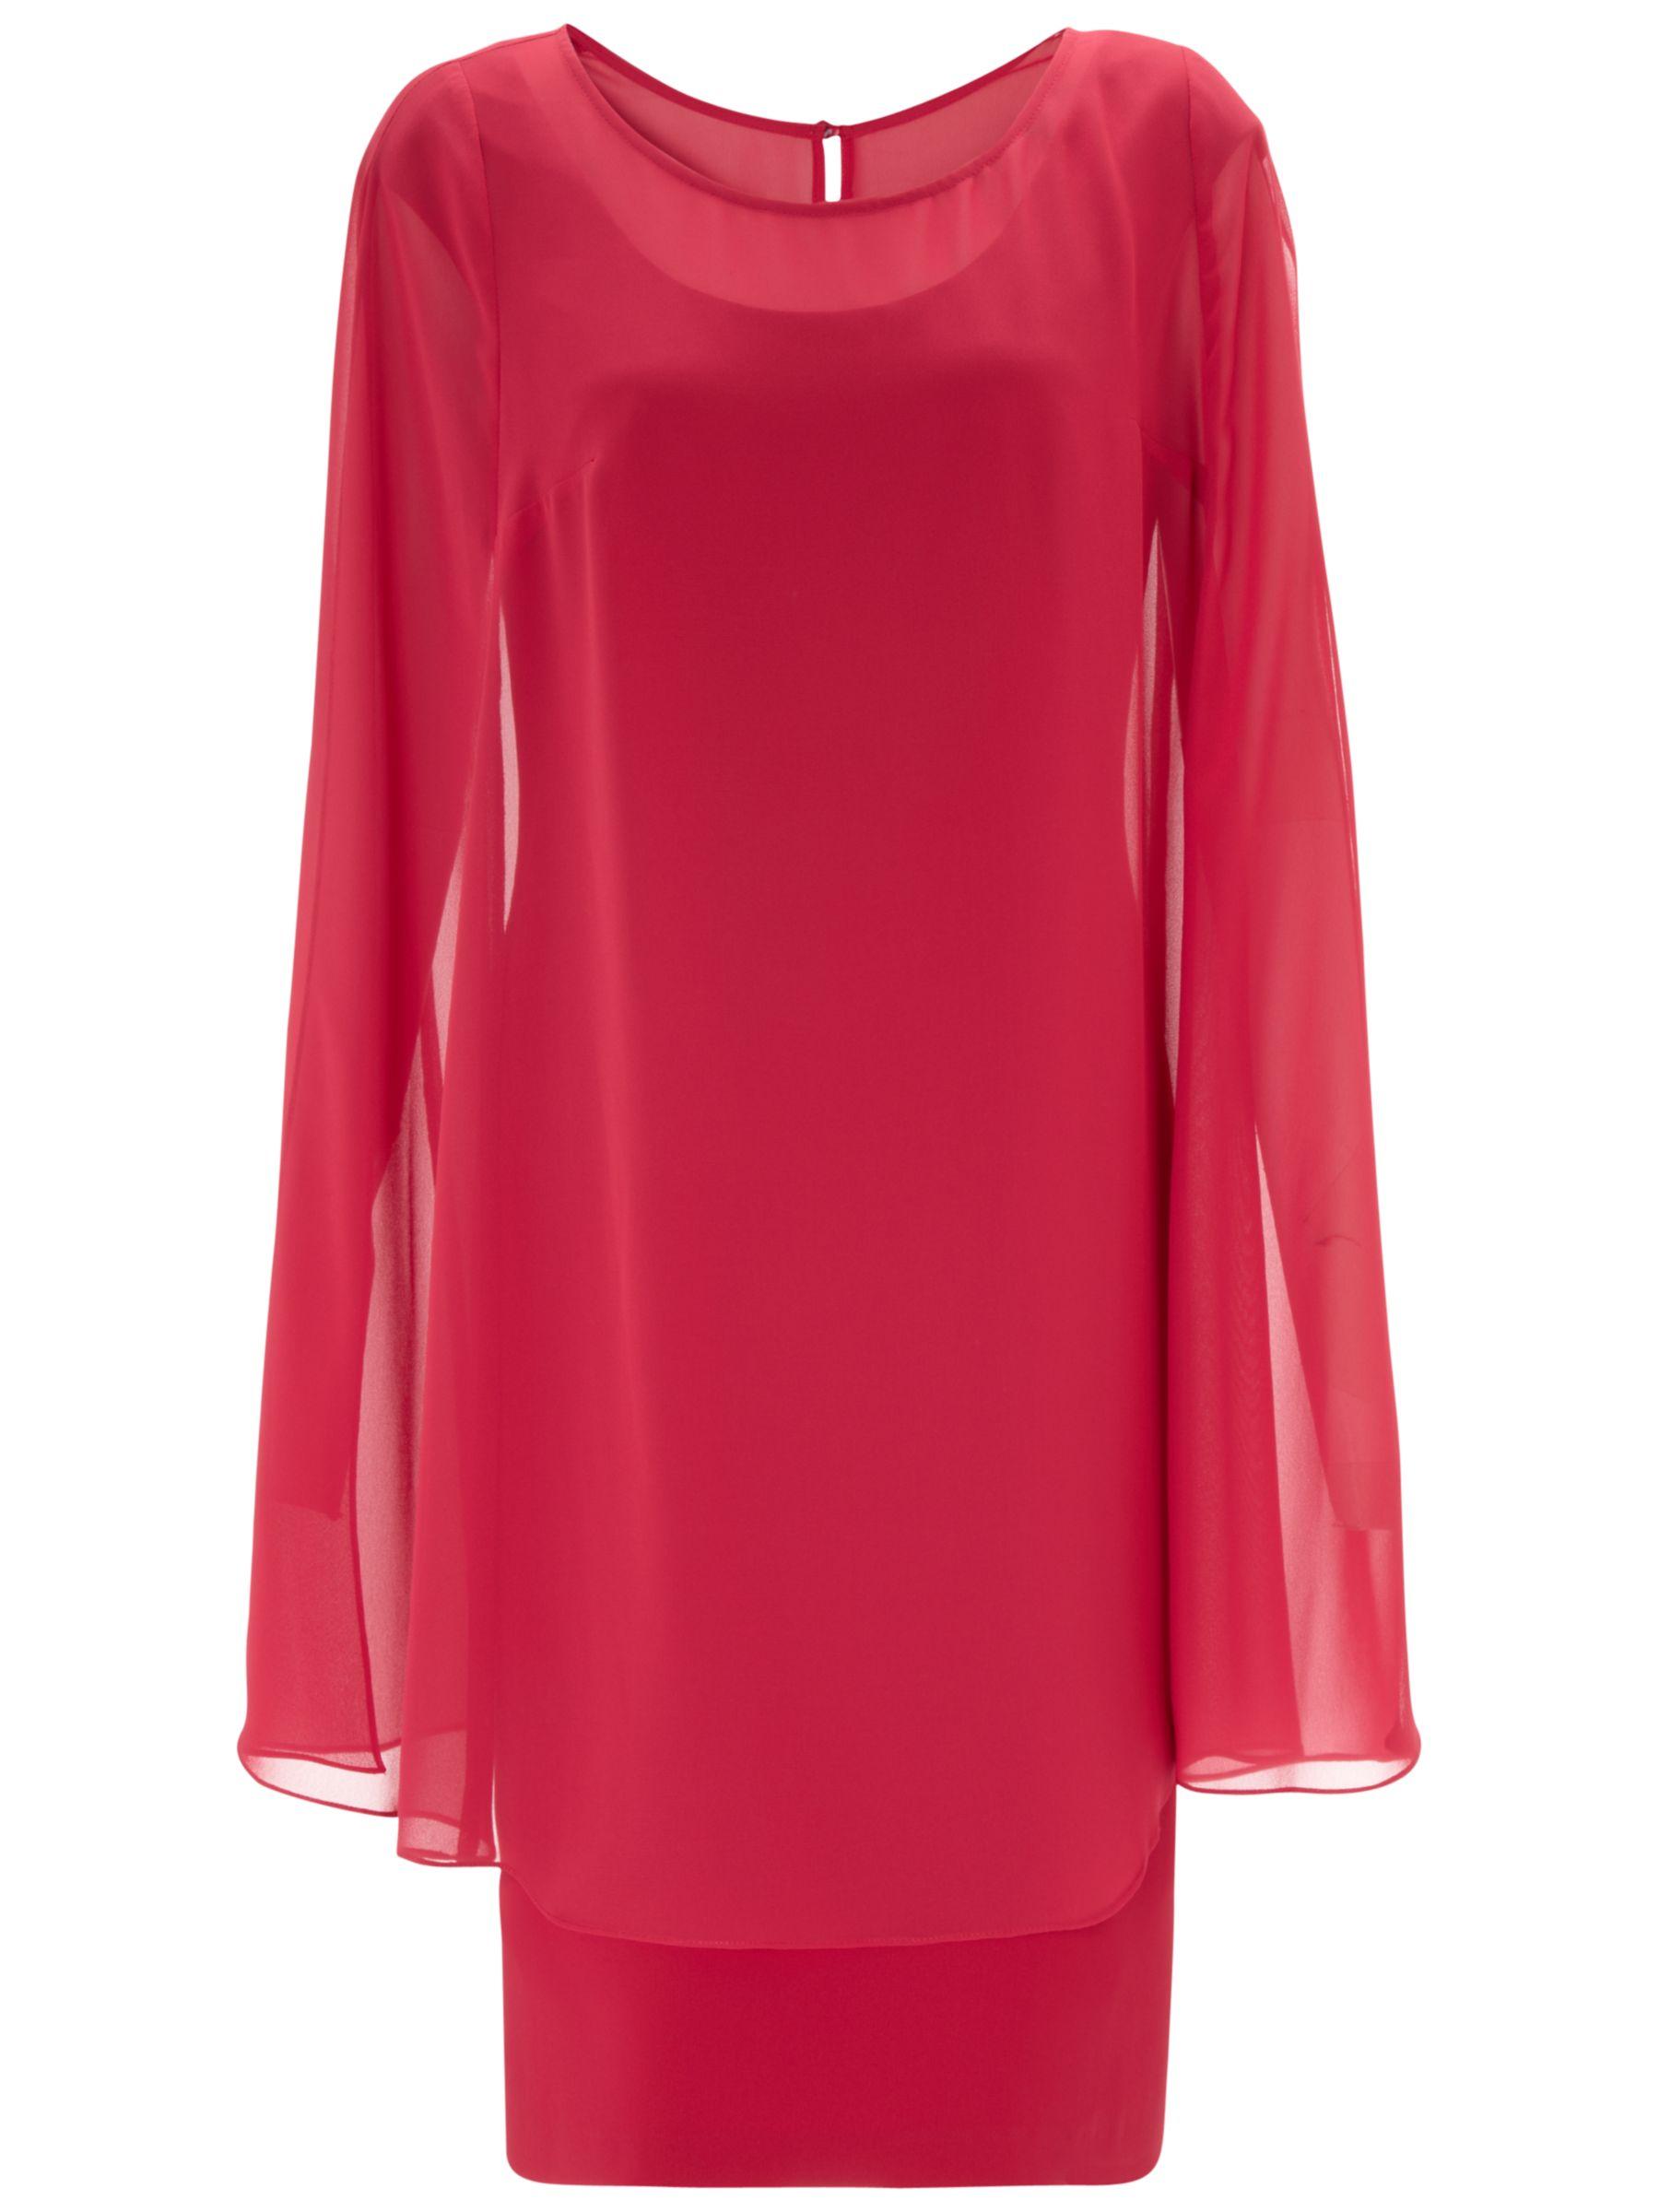 Gina Bacconi Dress And Cape, Poppy